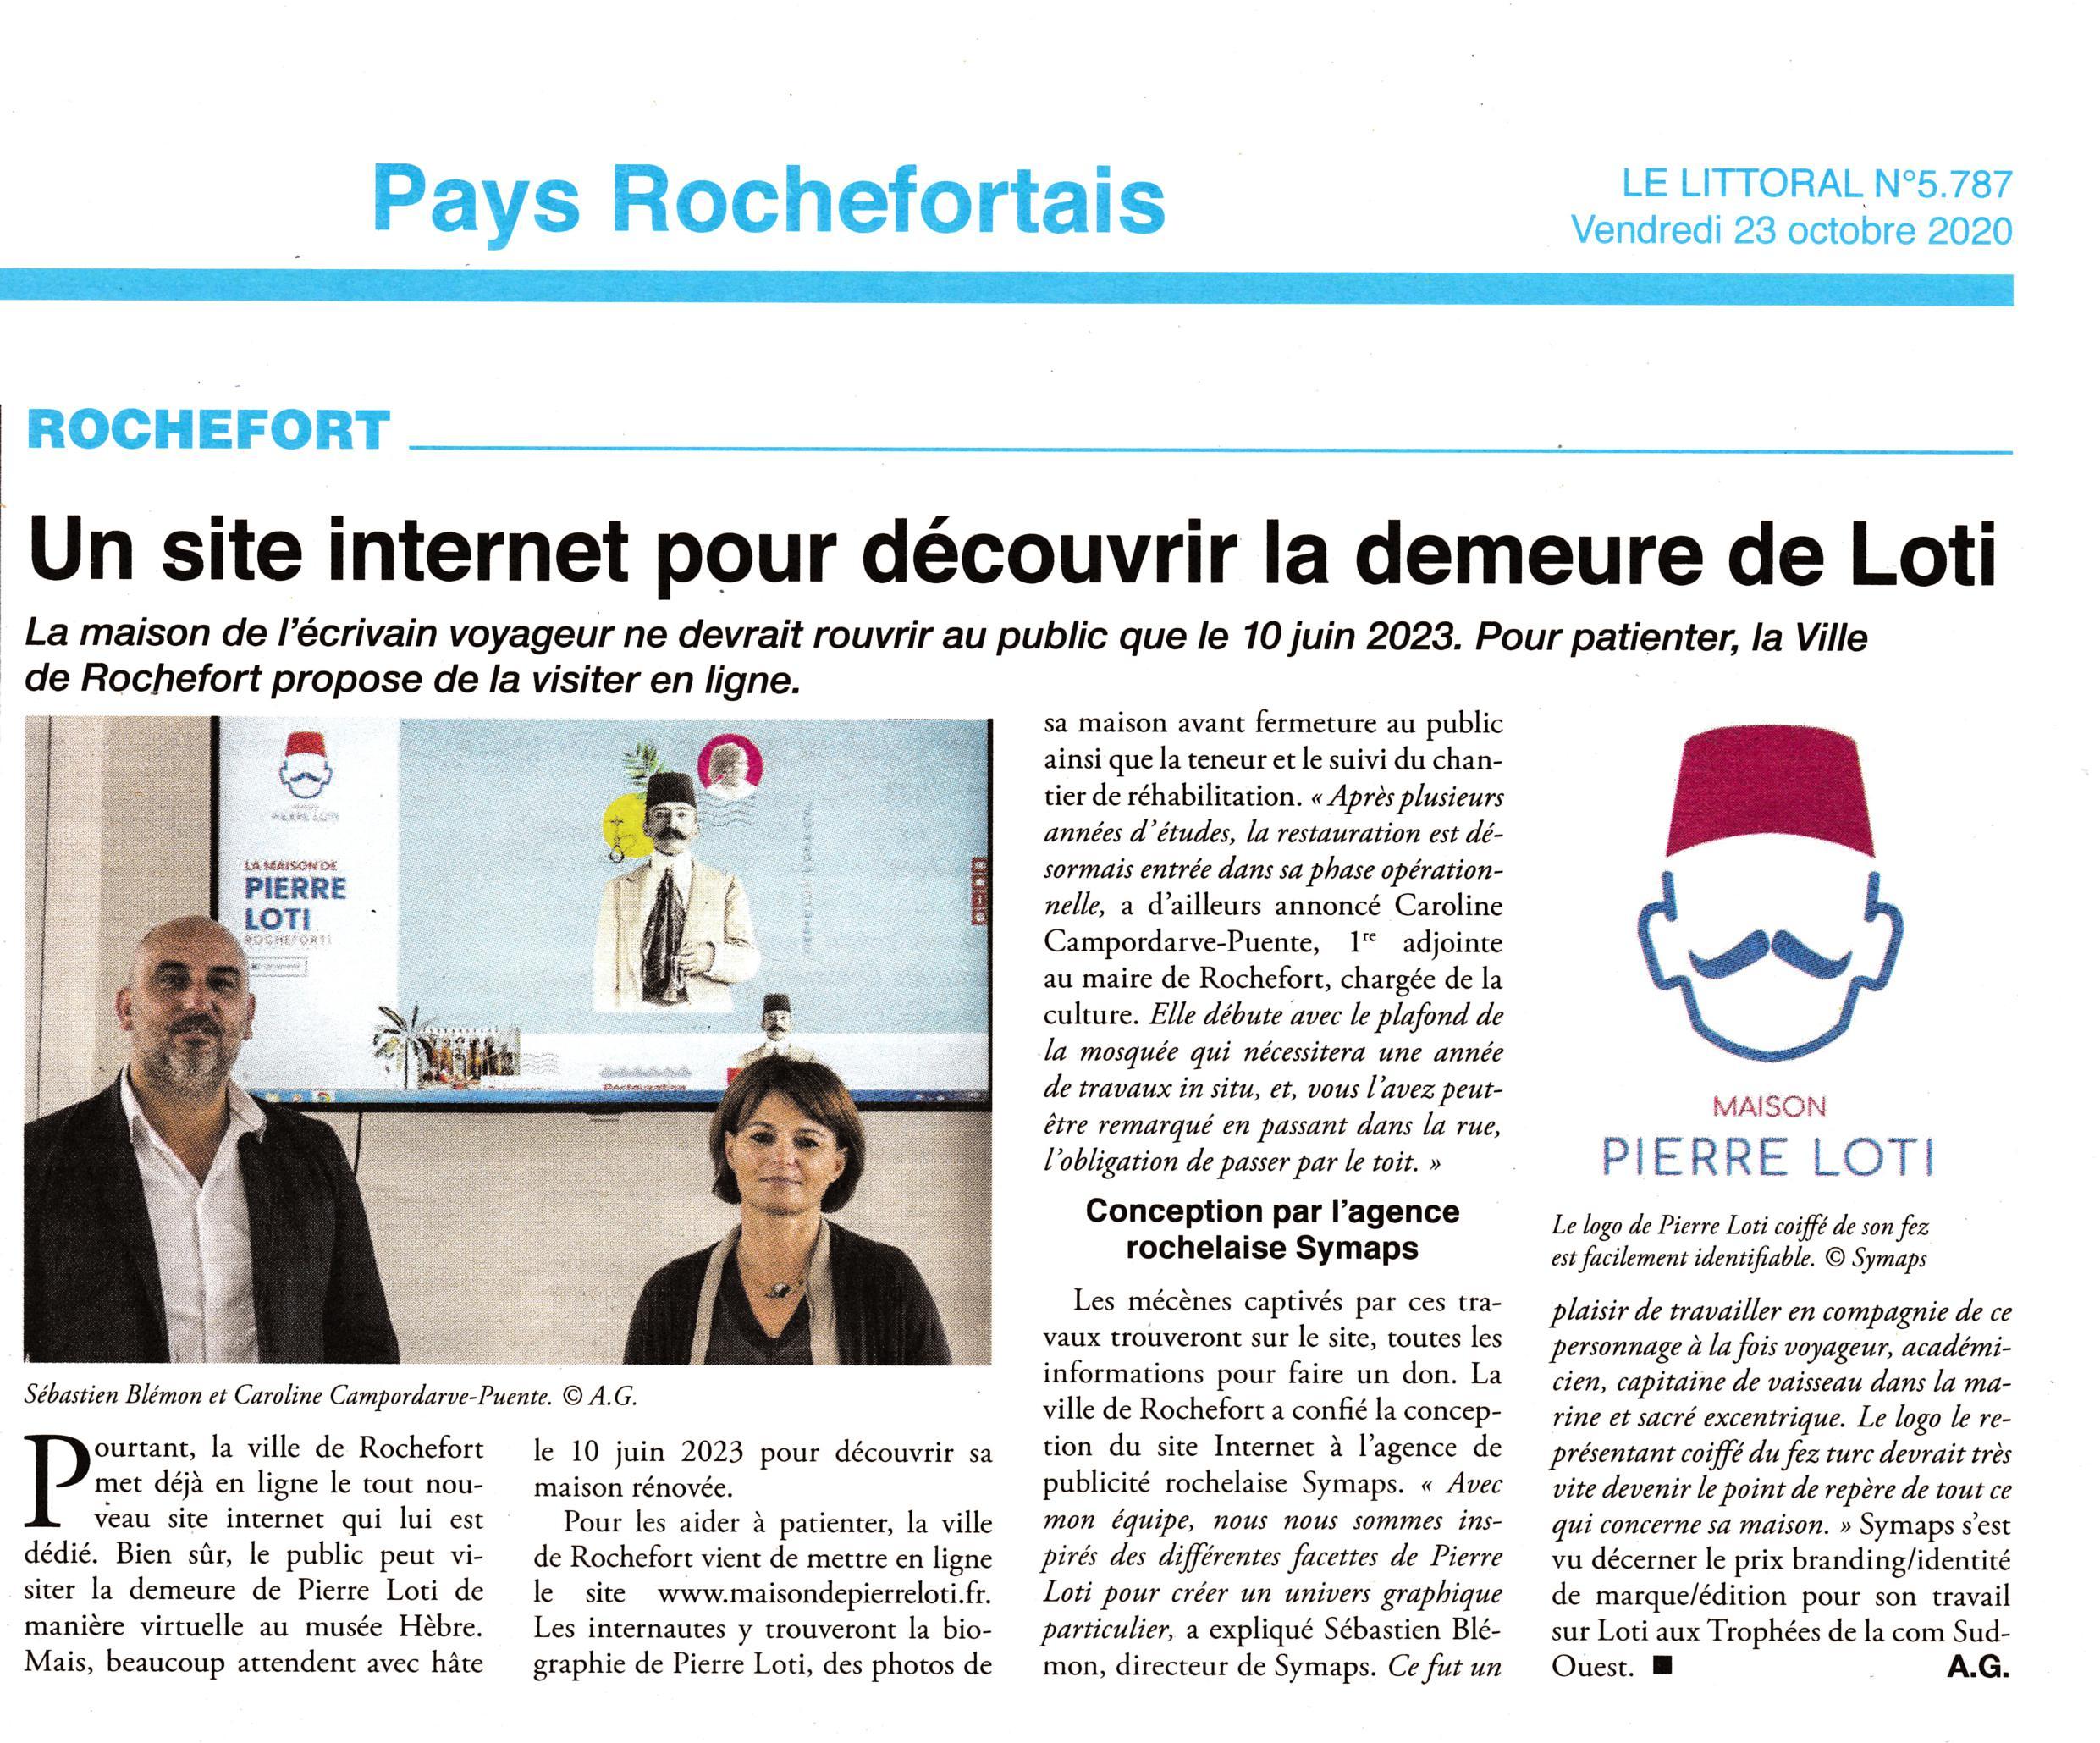 Art. journal pys rochefortais-site maison Loti-25-10-2020